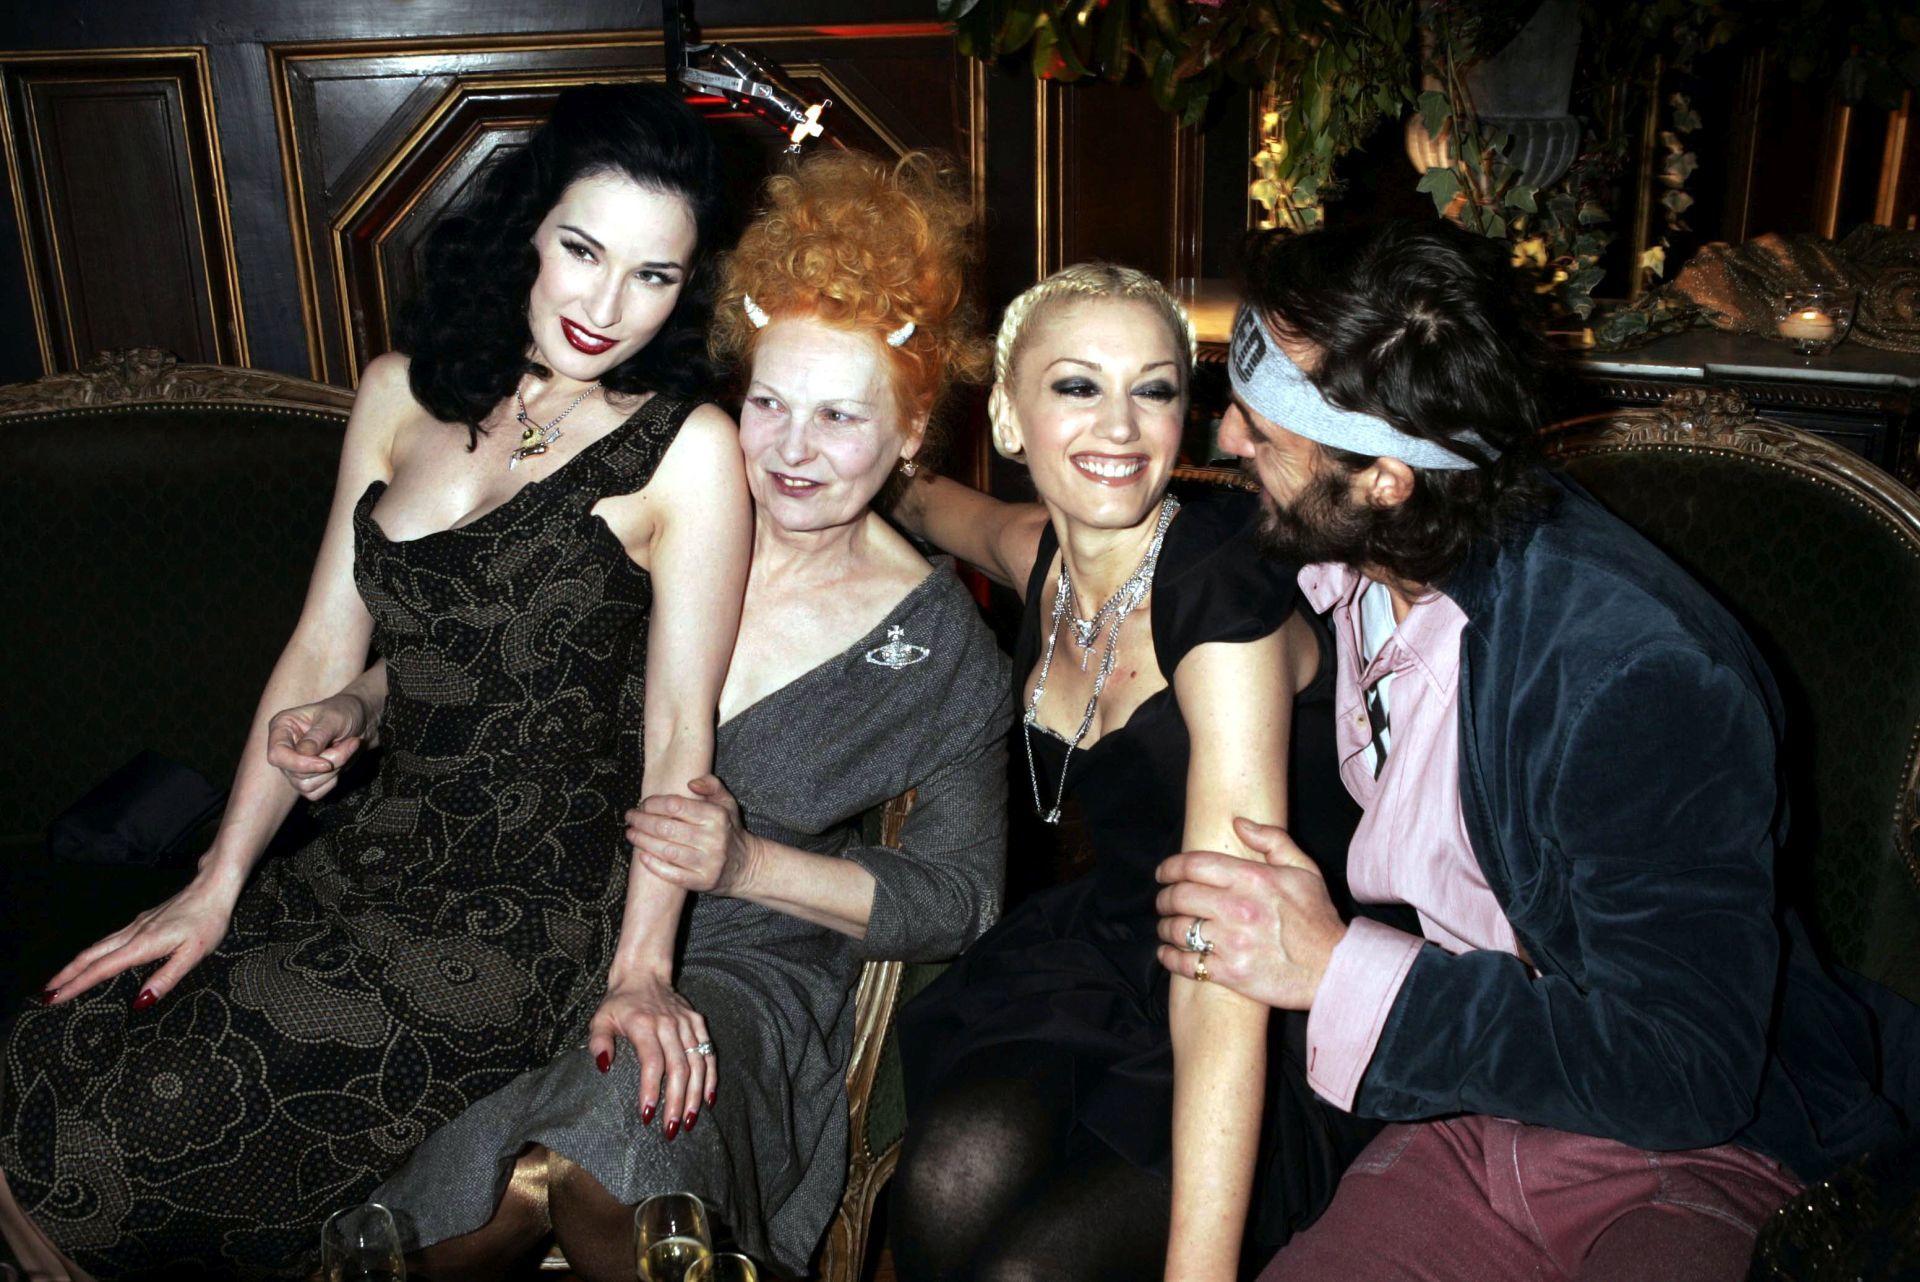 Dita Von Teese, Vivienne Westwood, Gwen Stefani és Andreas Kronthaler 2005-ben.